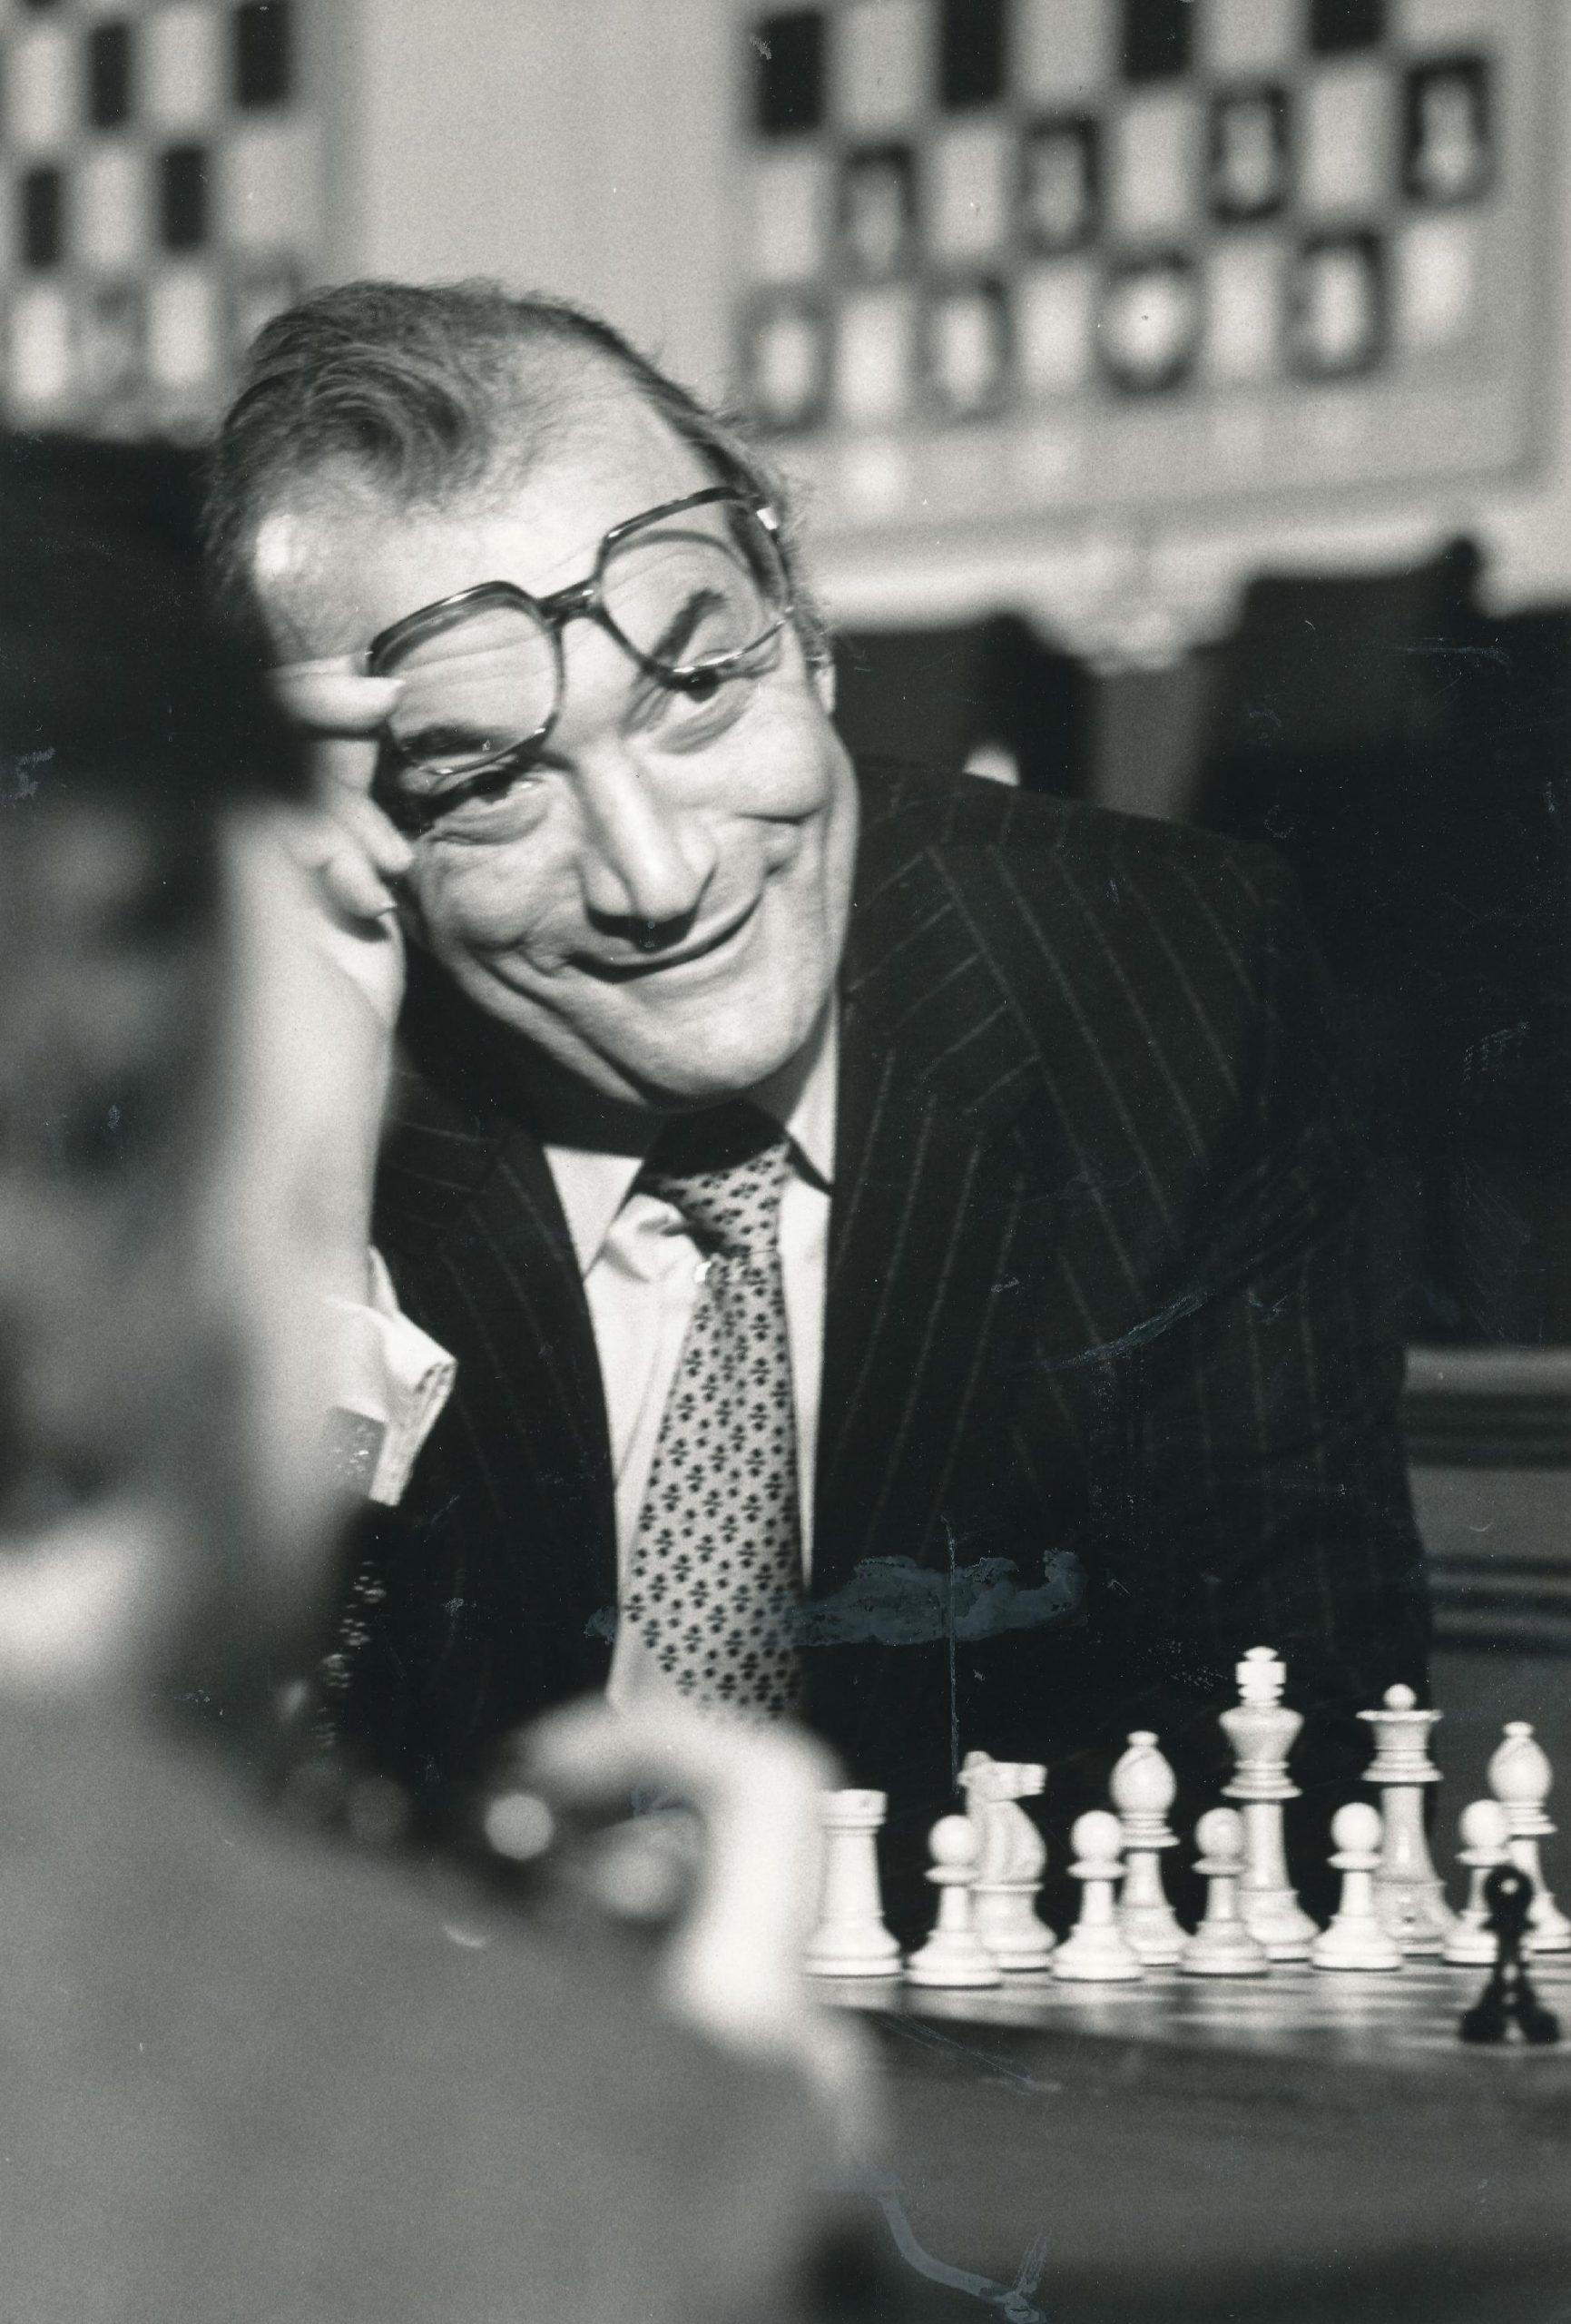 Viktor Lvovich Korchnoi